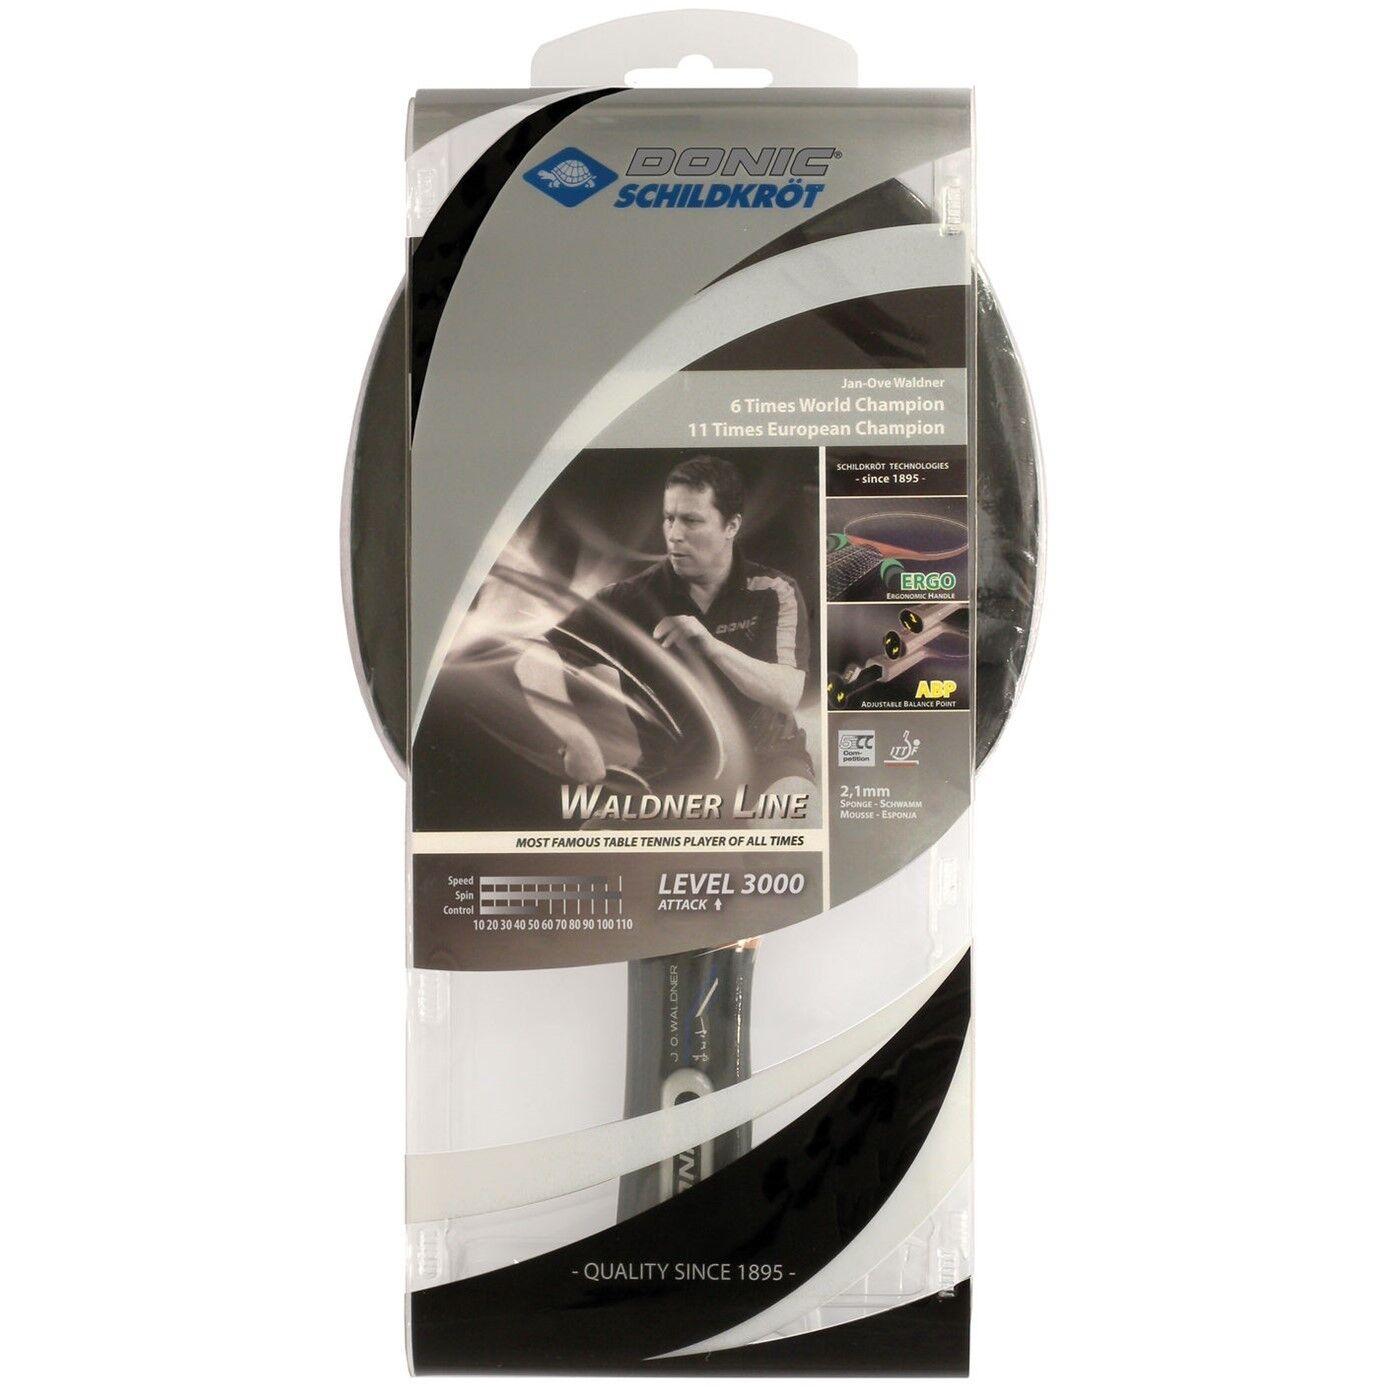 Donic Tischtennisschläger Tischtennisschläger Tischtennisschläger Waldner 3000 Carbon ABP Tischtennis Wettkampfschläger d0add7